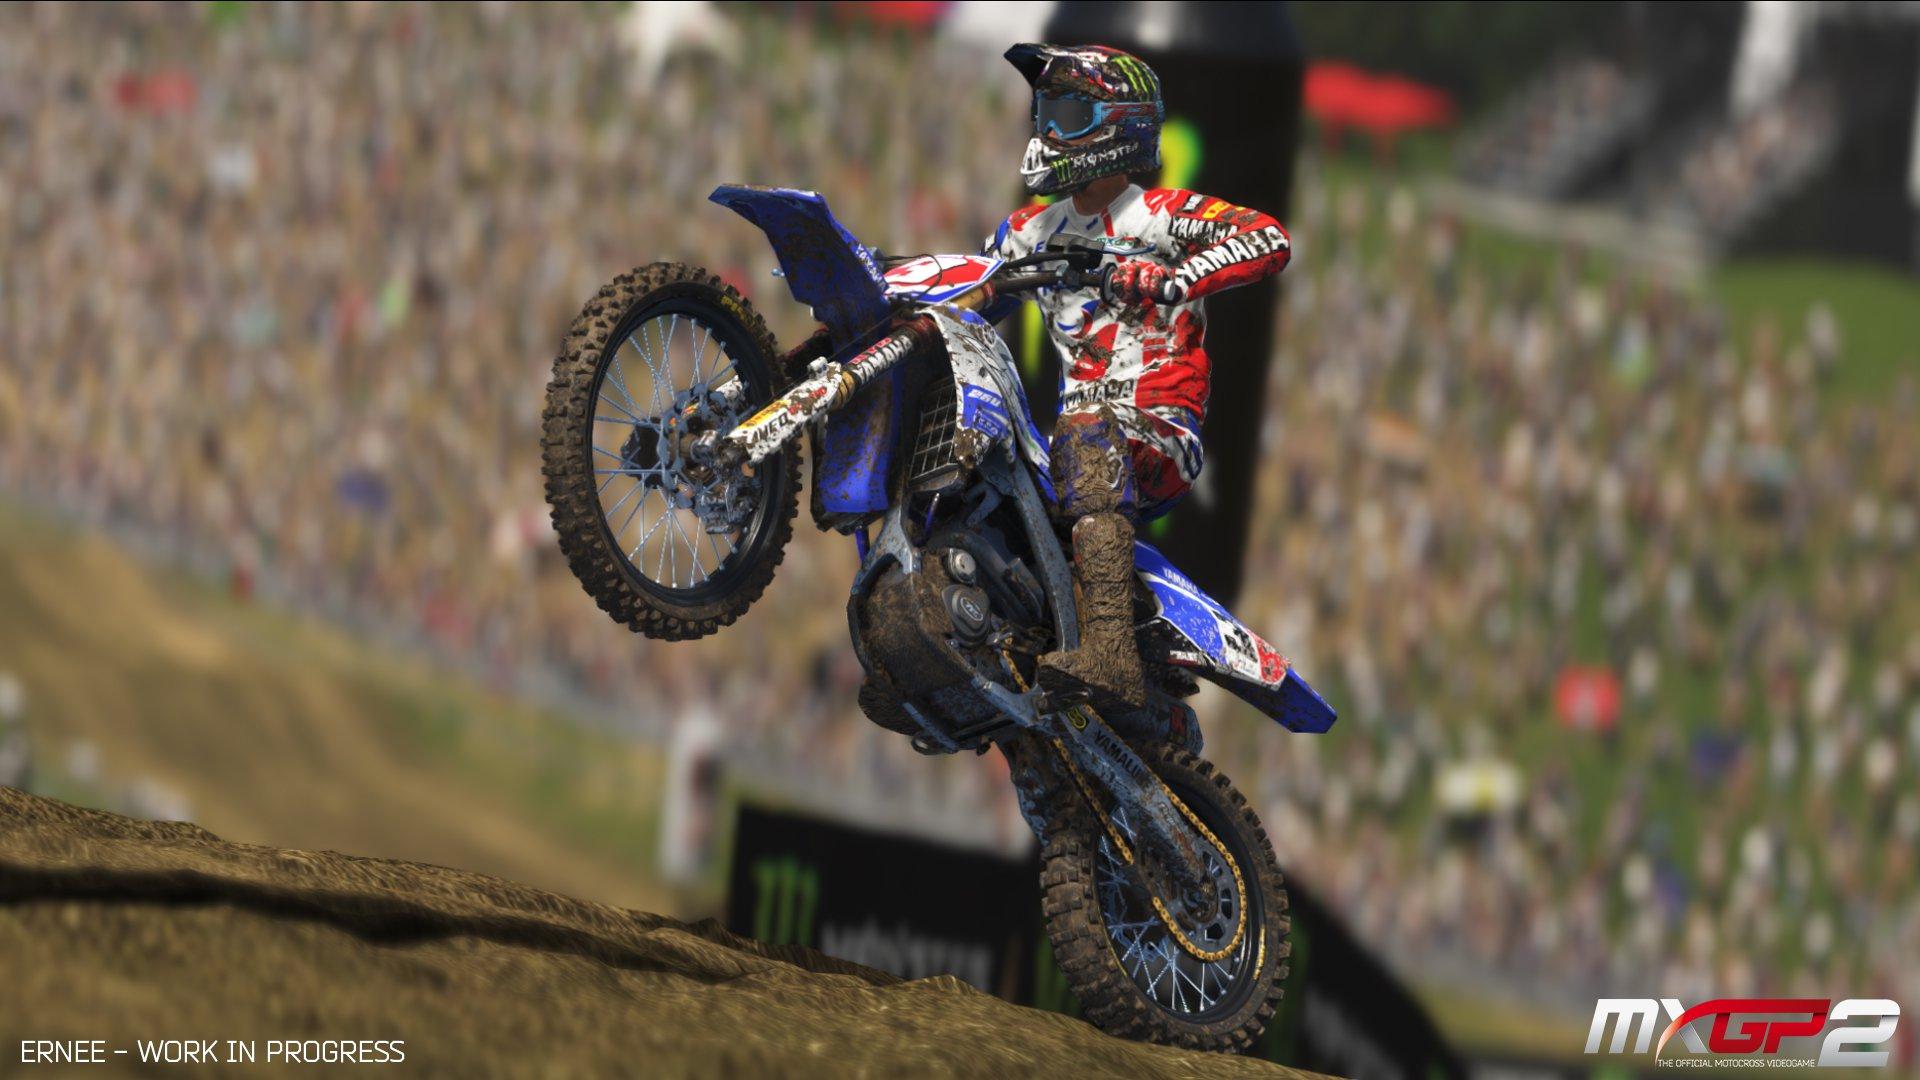 MXGP2 The Official Motocross Videogame 10